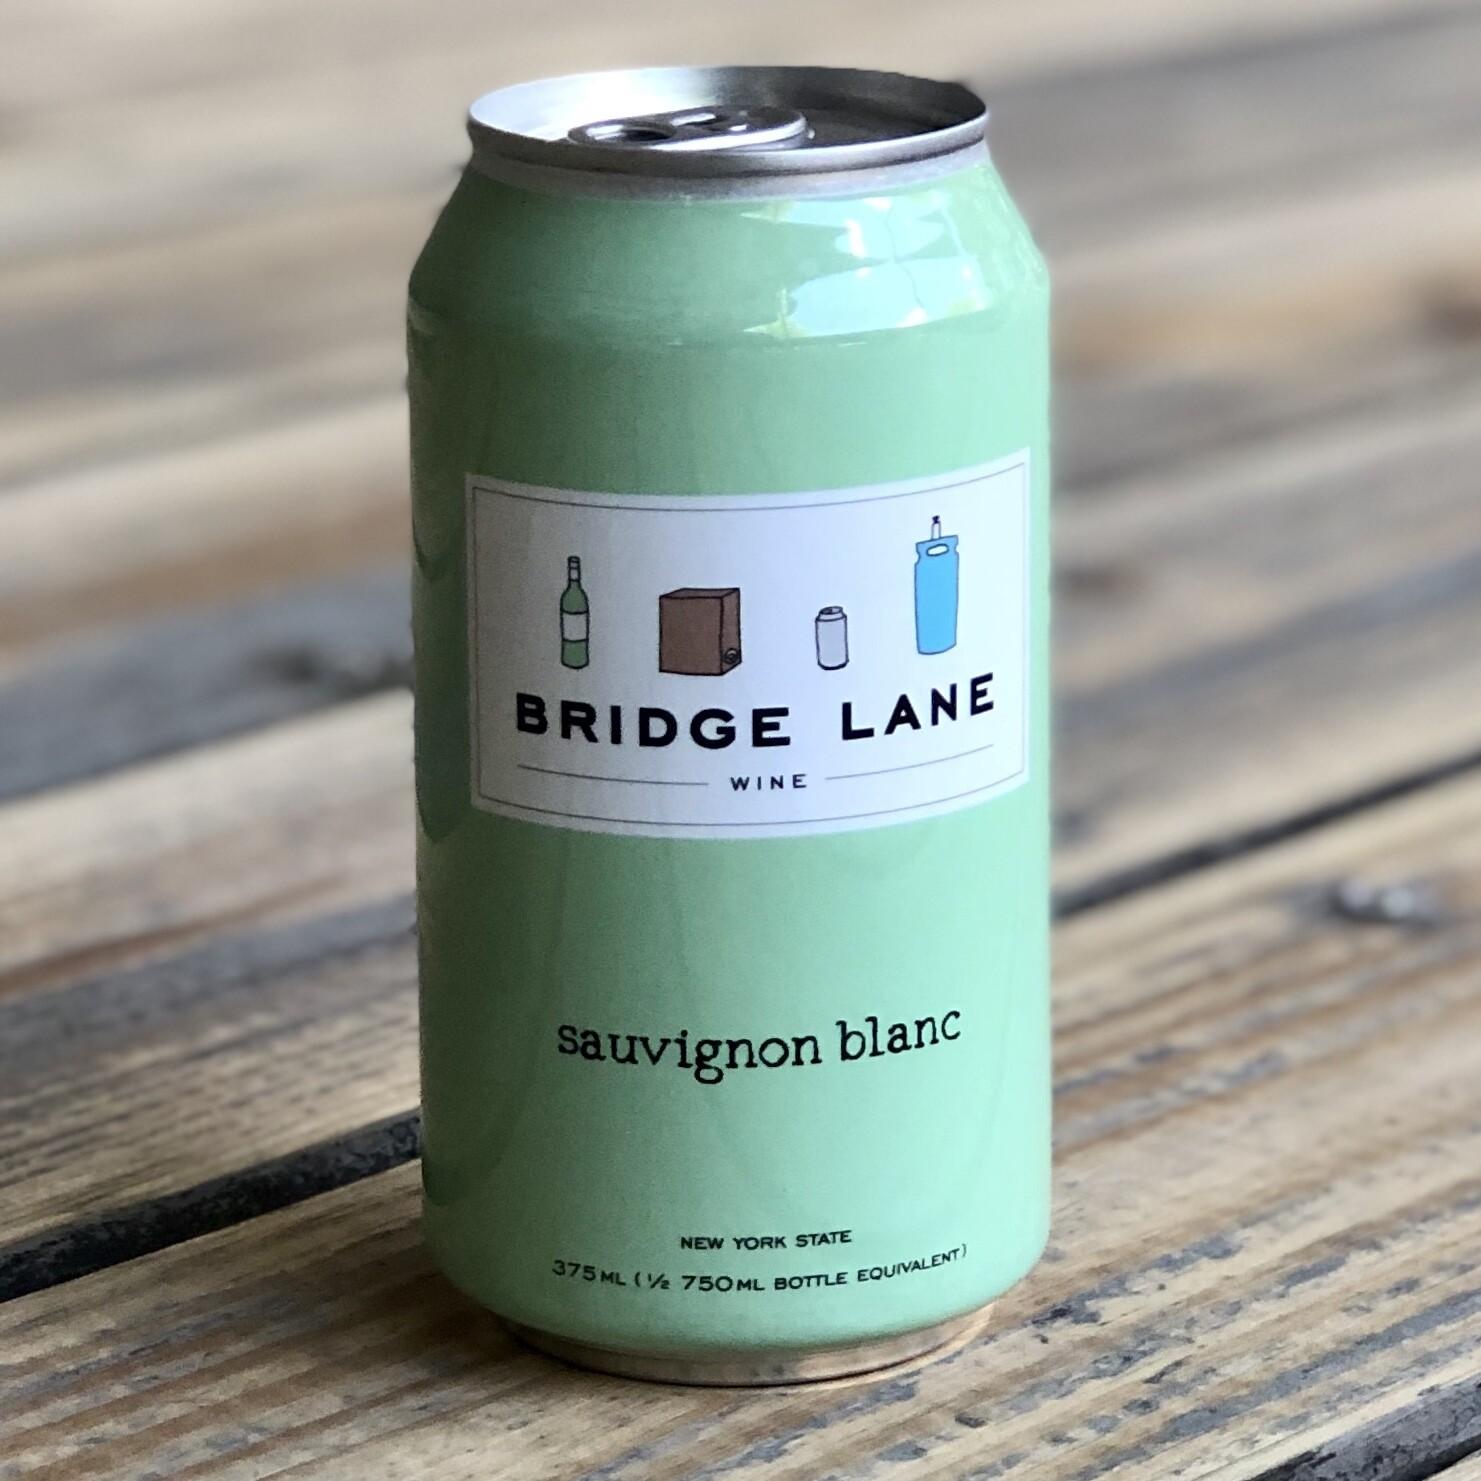 Bridge Lane Sauvignon Blanc (375ml Can)